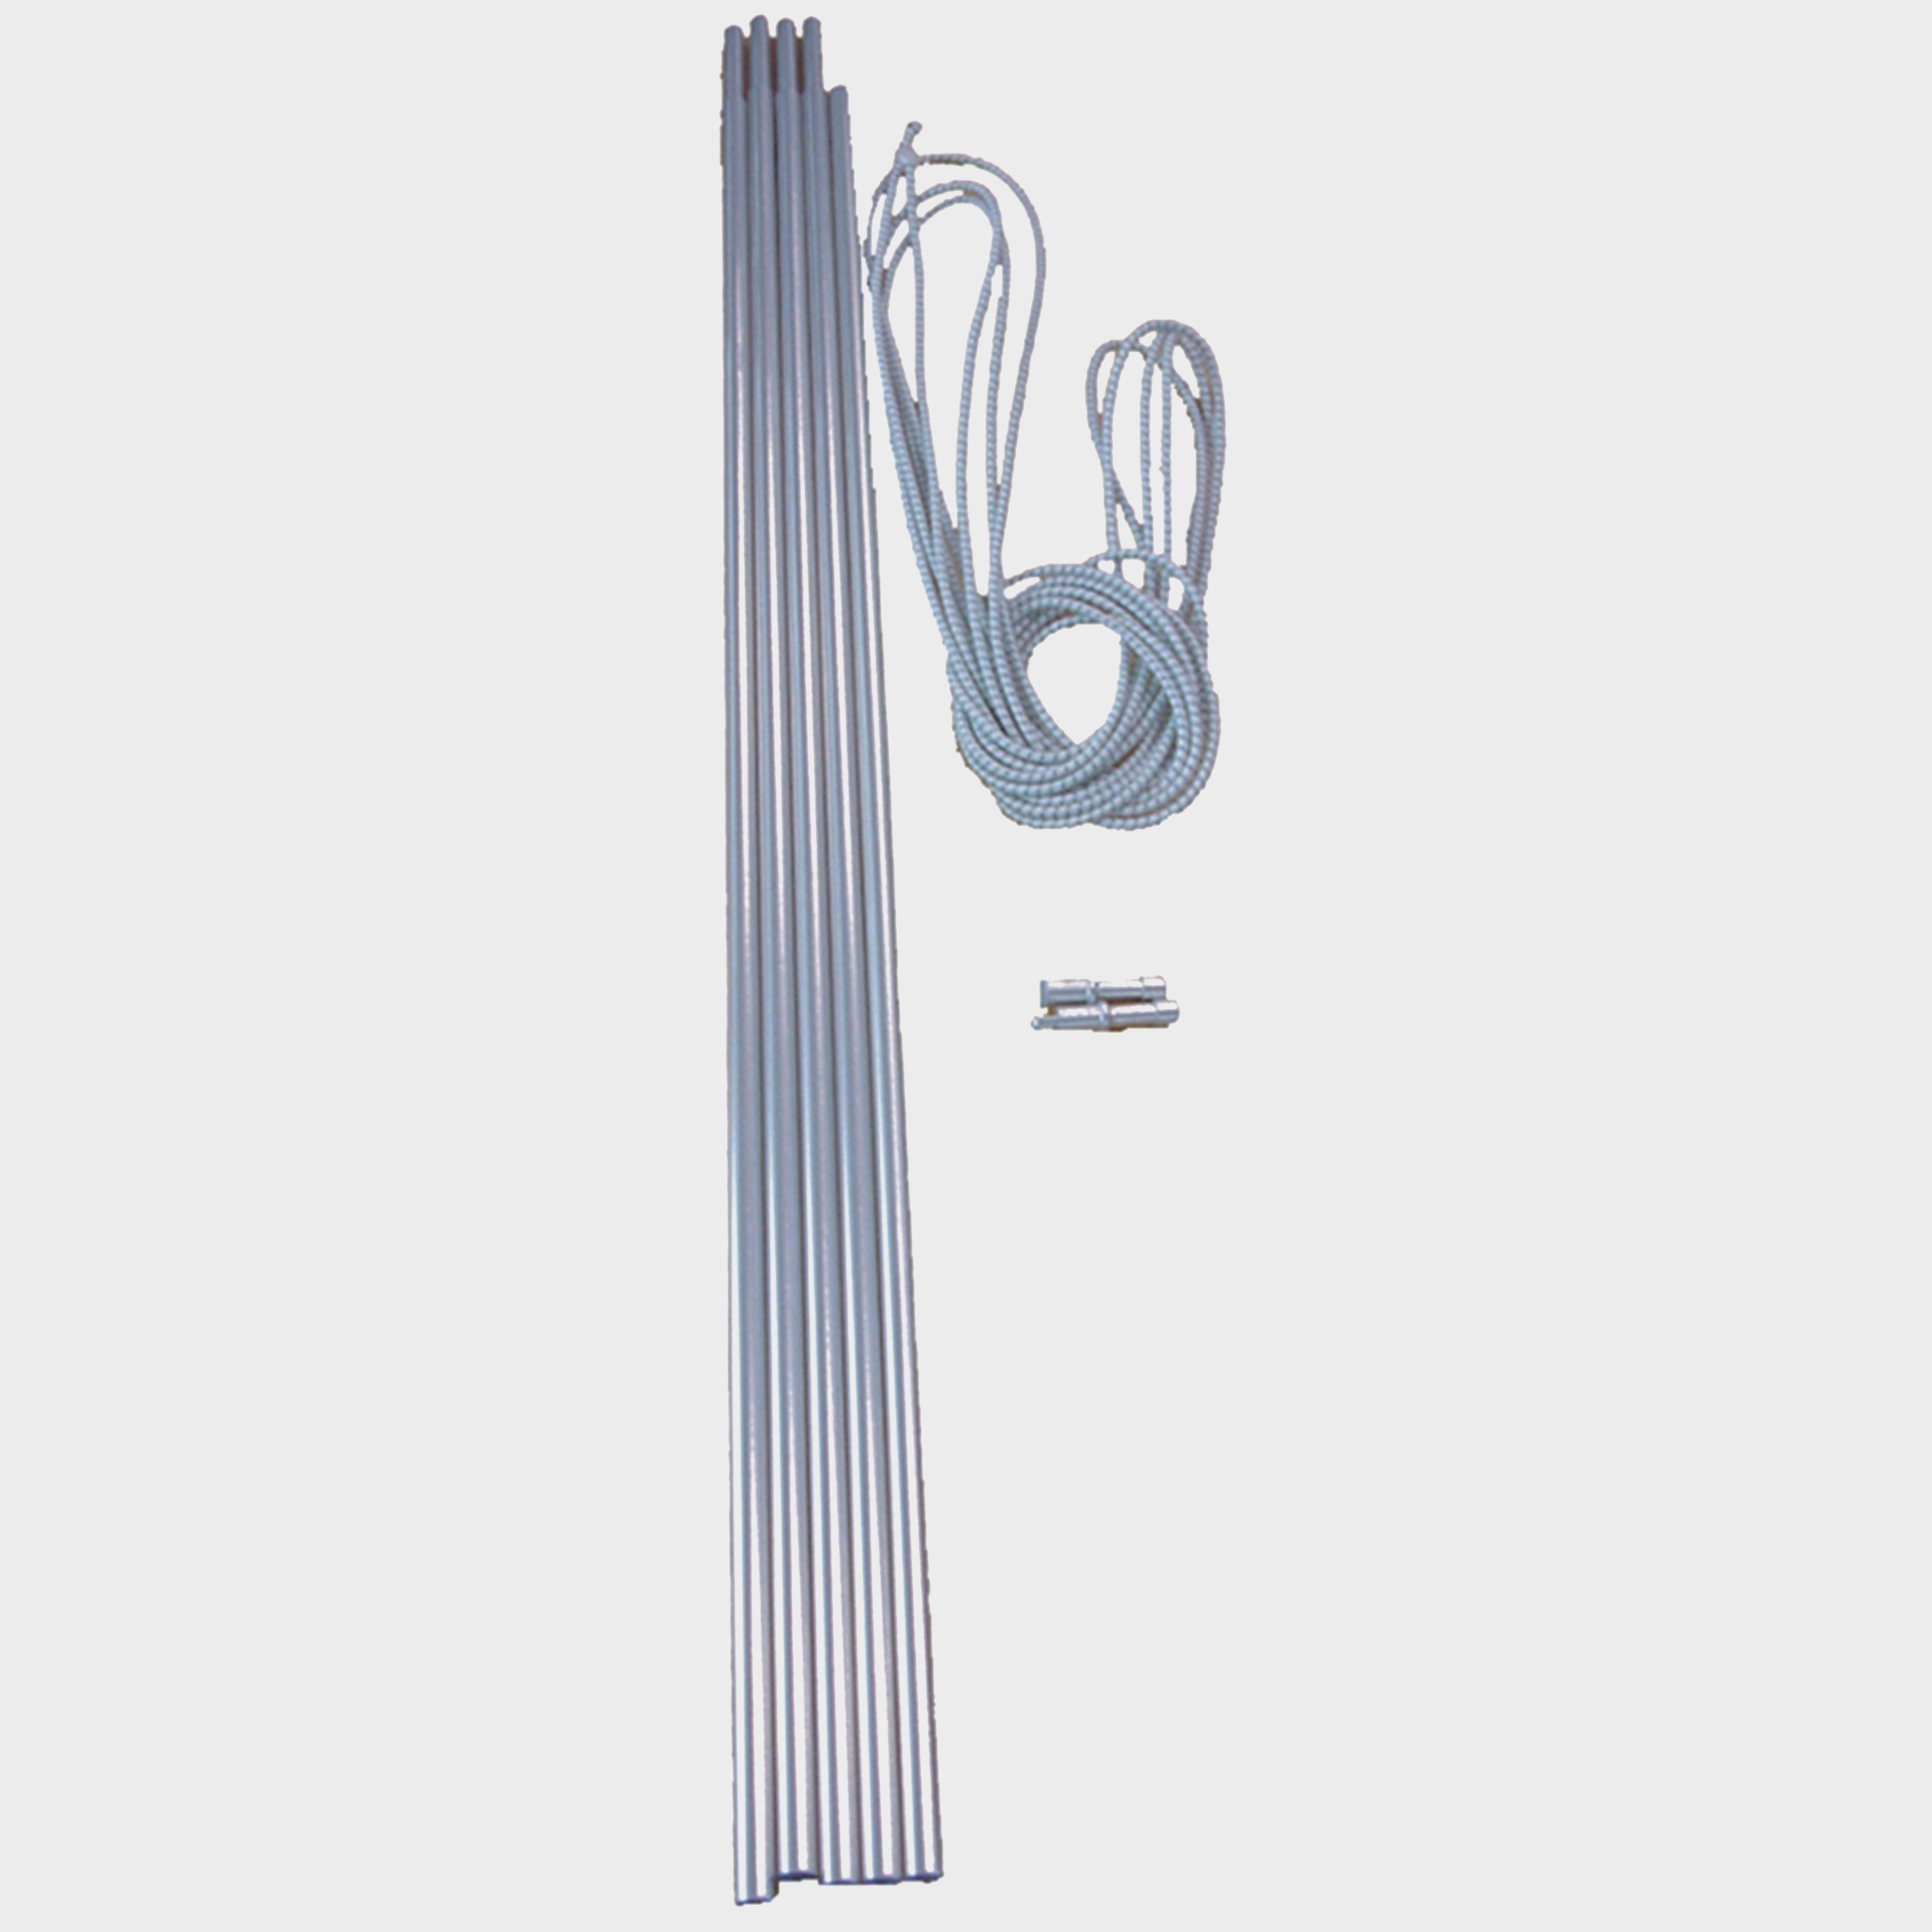 Vango Vango Alloy Corded 9.5mm Tent Pole Set - Silver, Silver